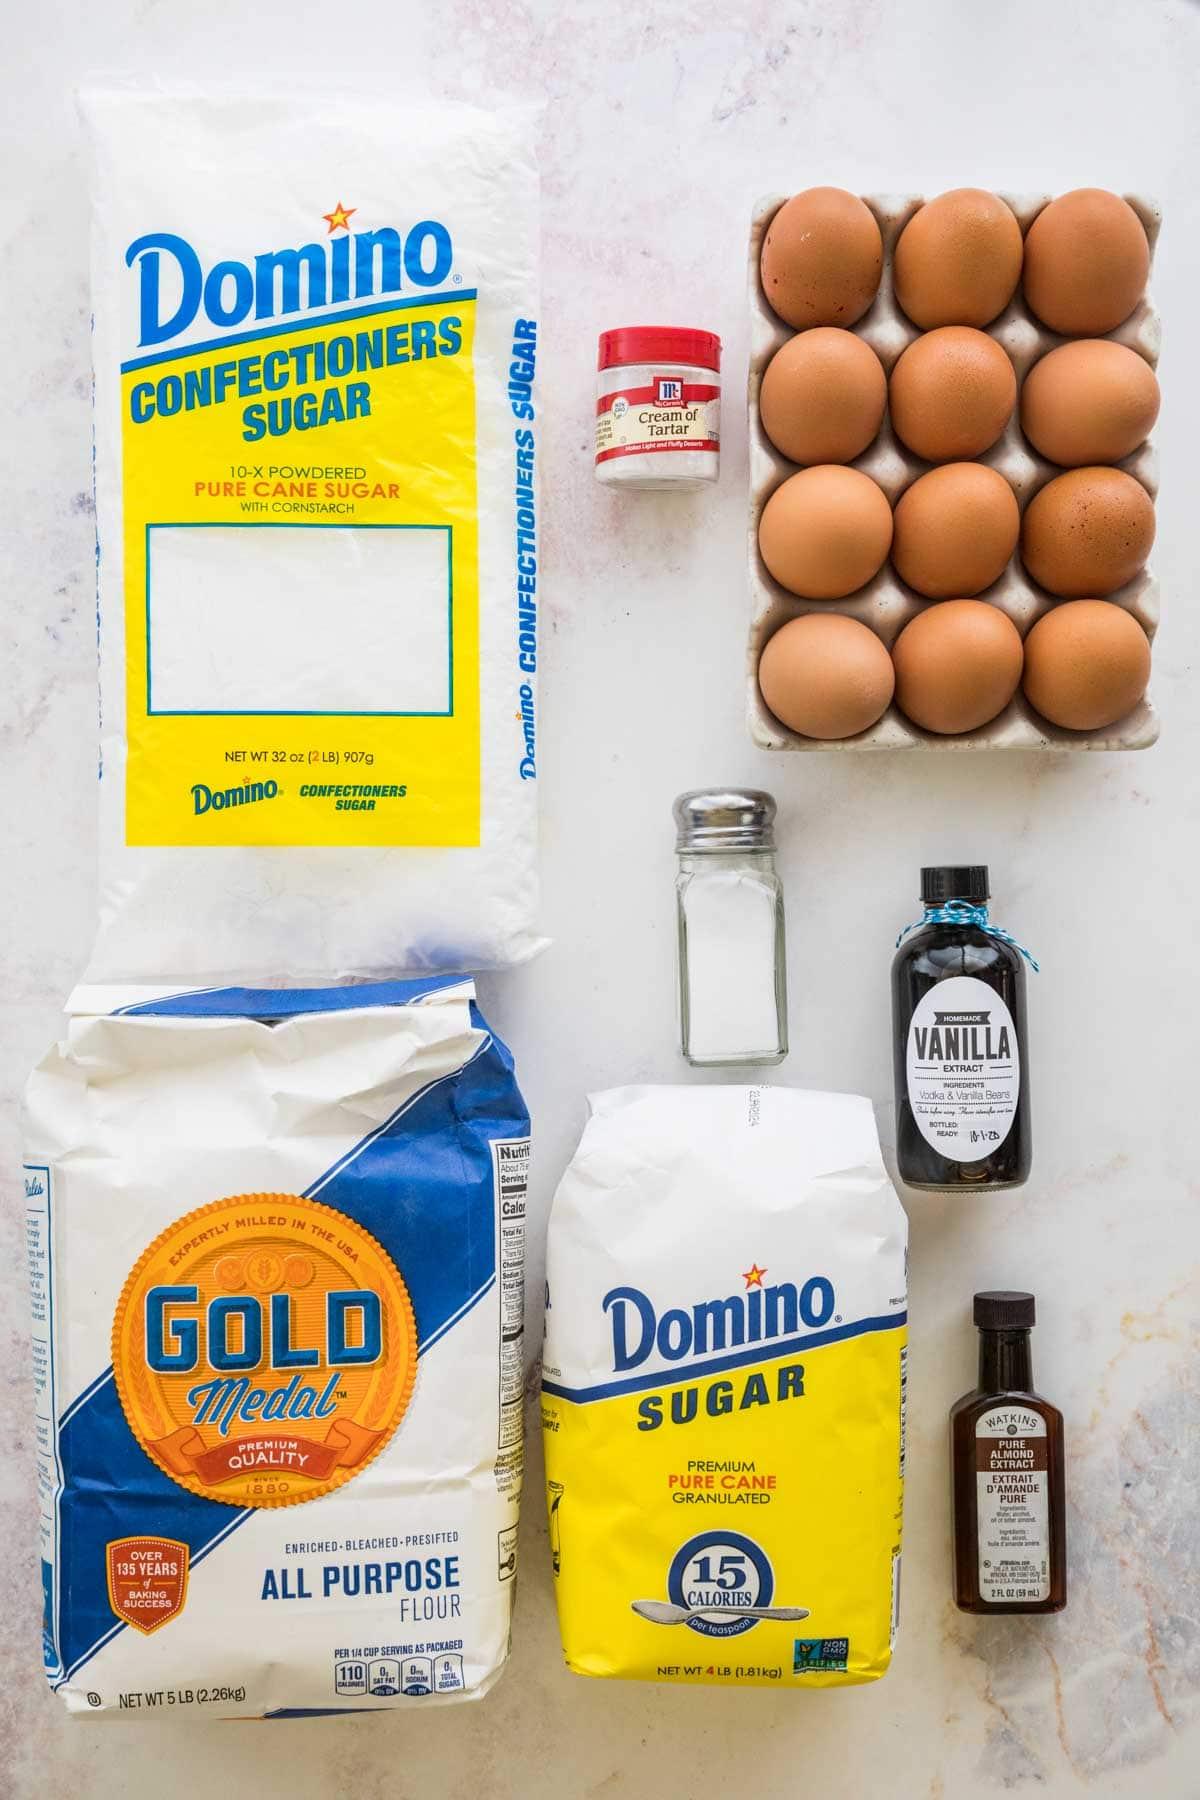 Powdered sugar, cream of tartar, eggs, vanilla extract, almond extract, granulated sugar, salt, and flour